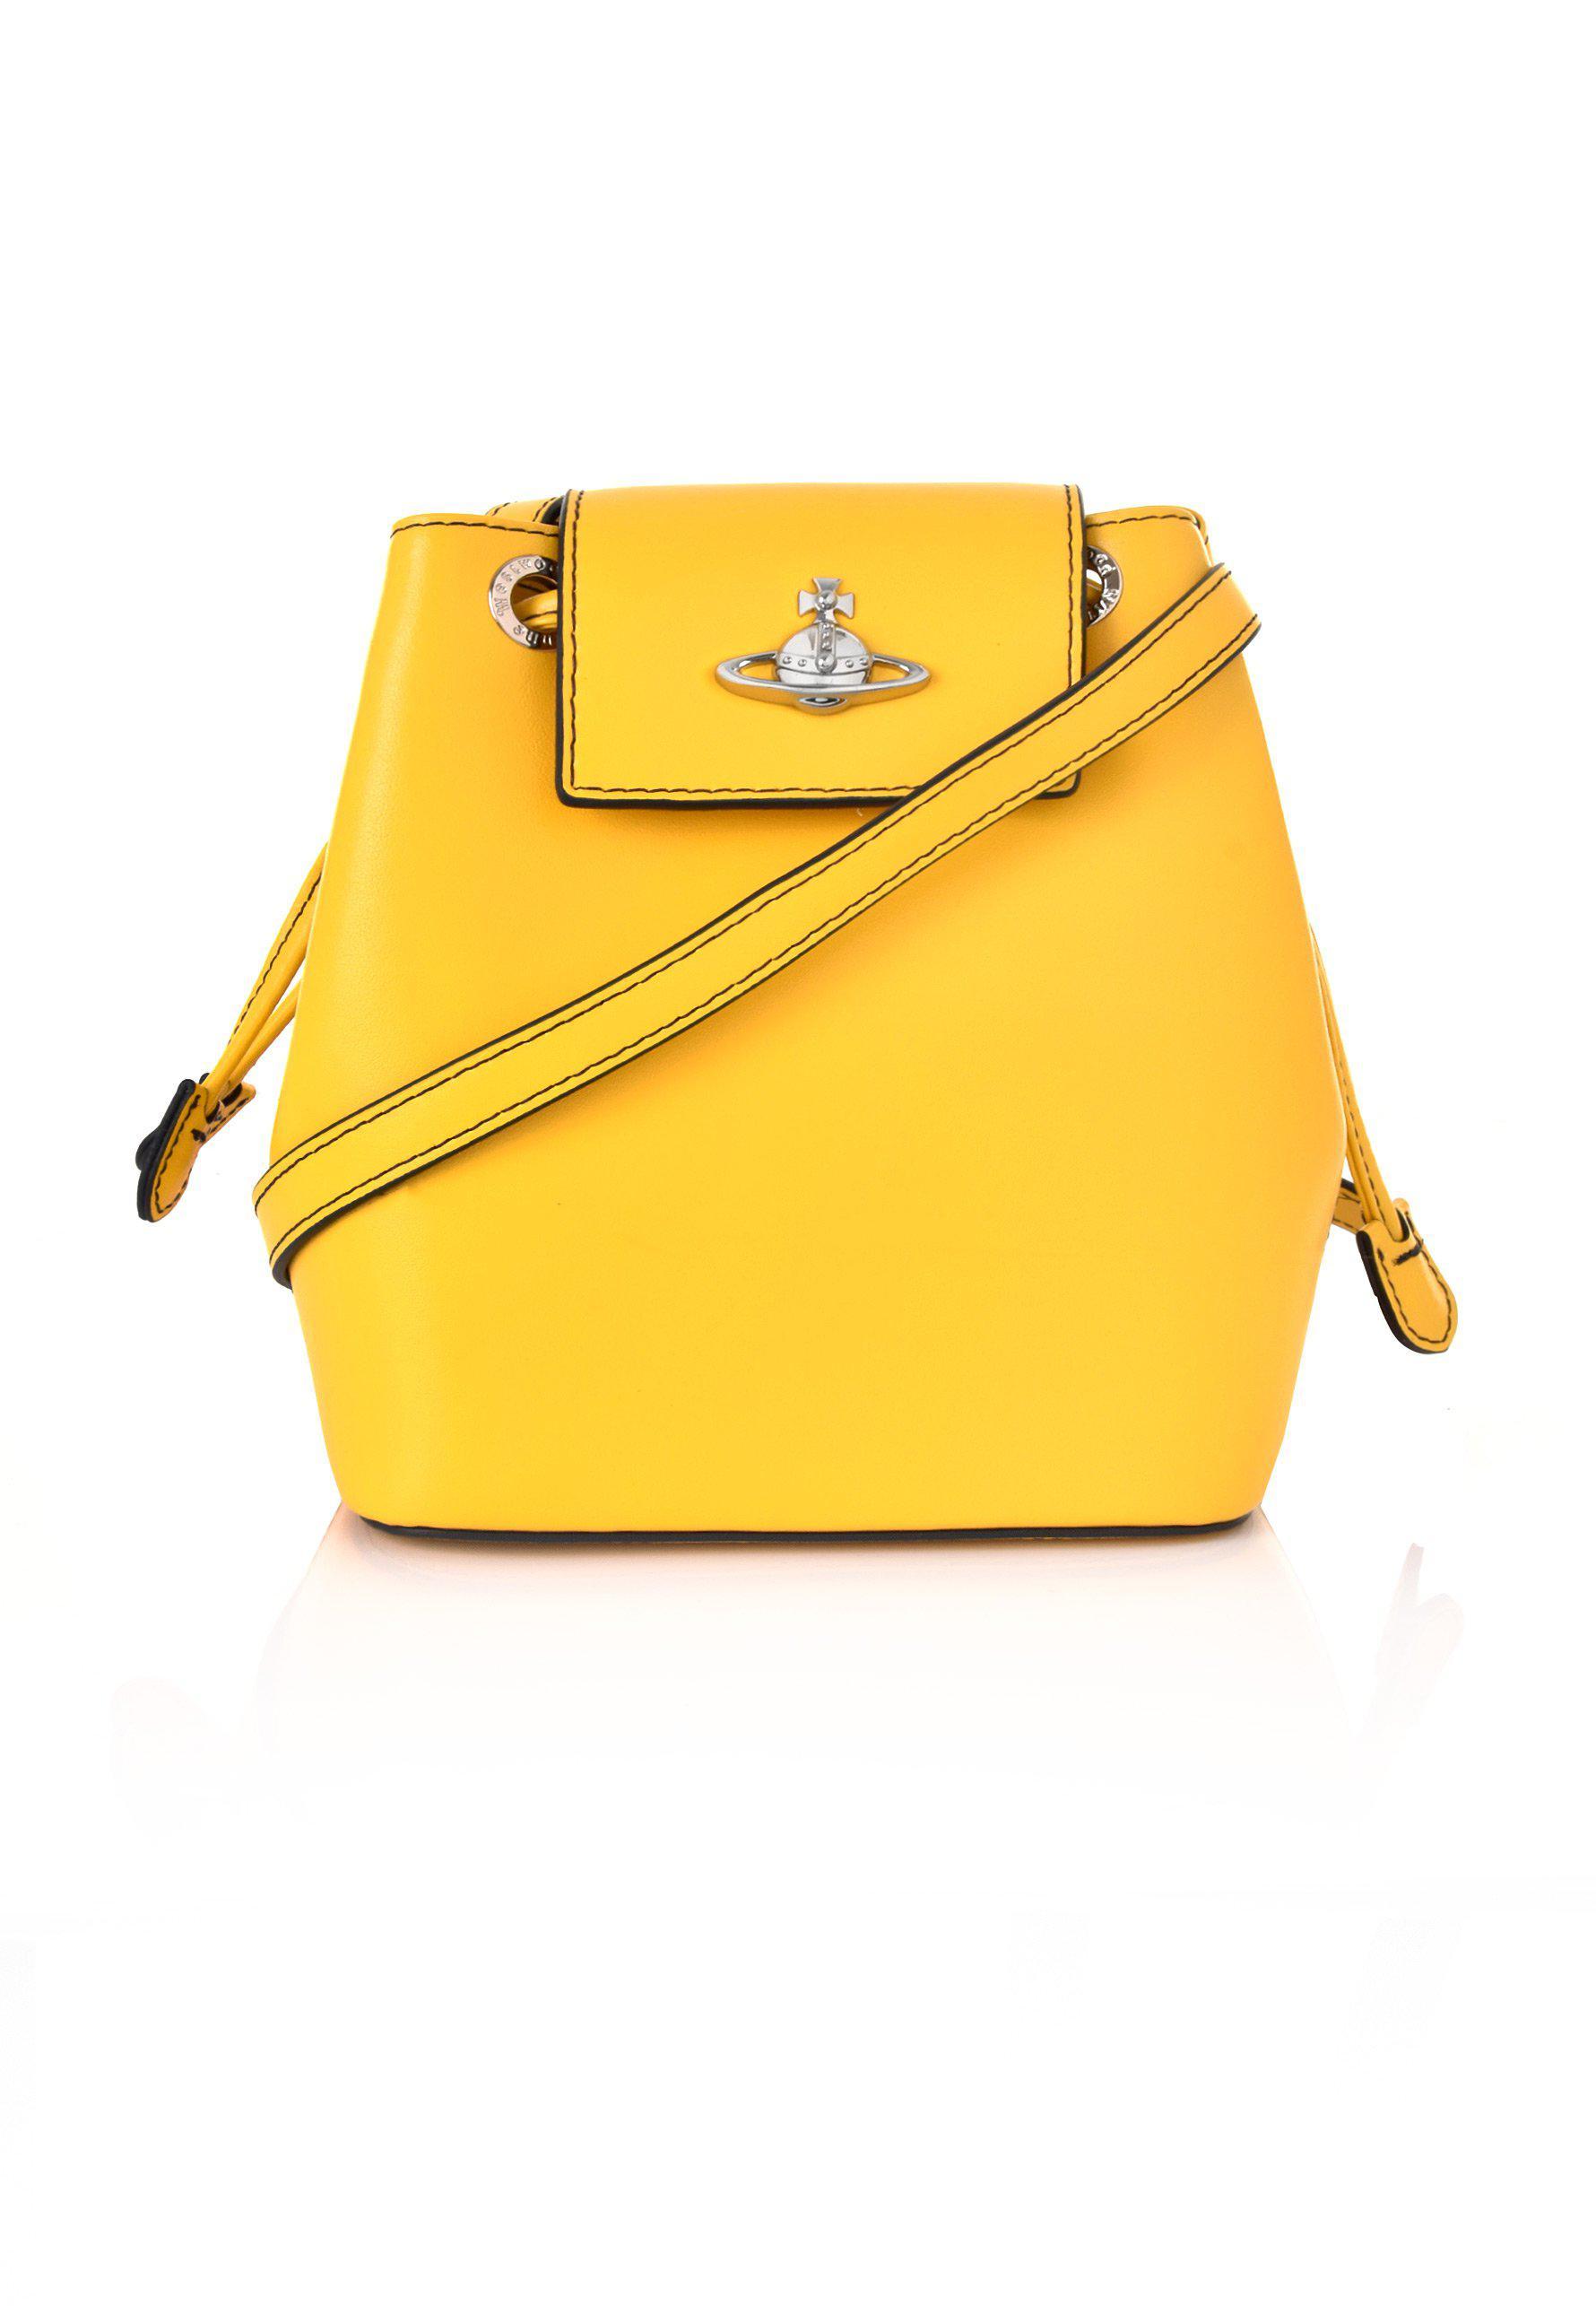 cf4c938befe Vivienne Westwood Matilda Bucket Bag 43020010 Yellow in Yellow - Lyst